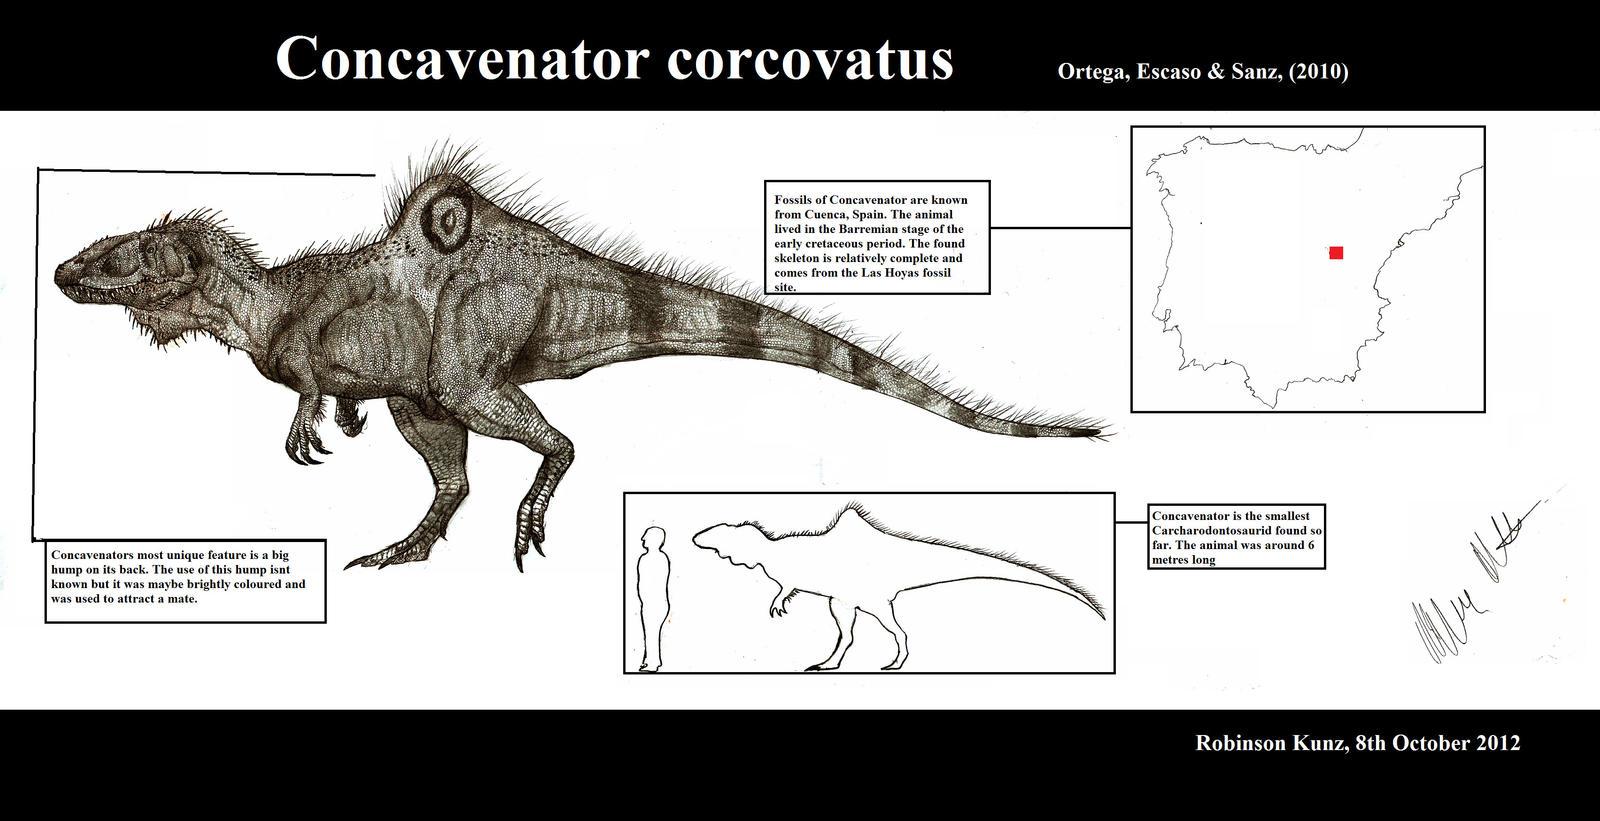 Concavenator corcovatus by Teratophoneus